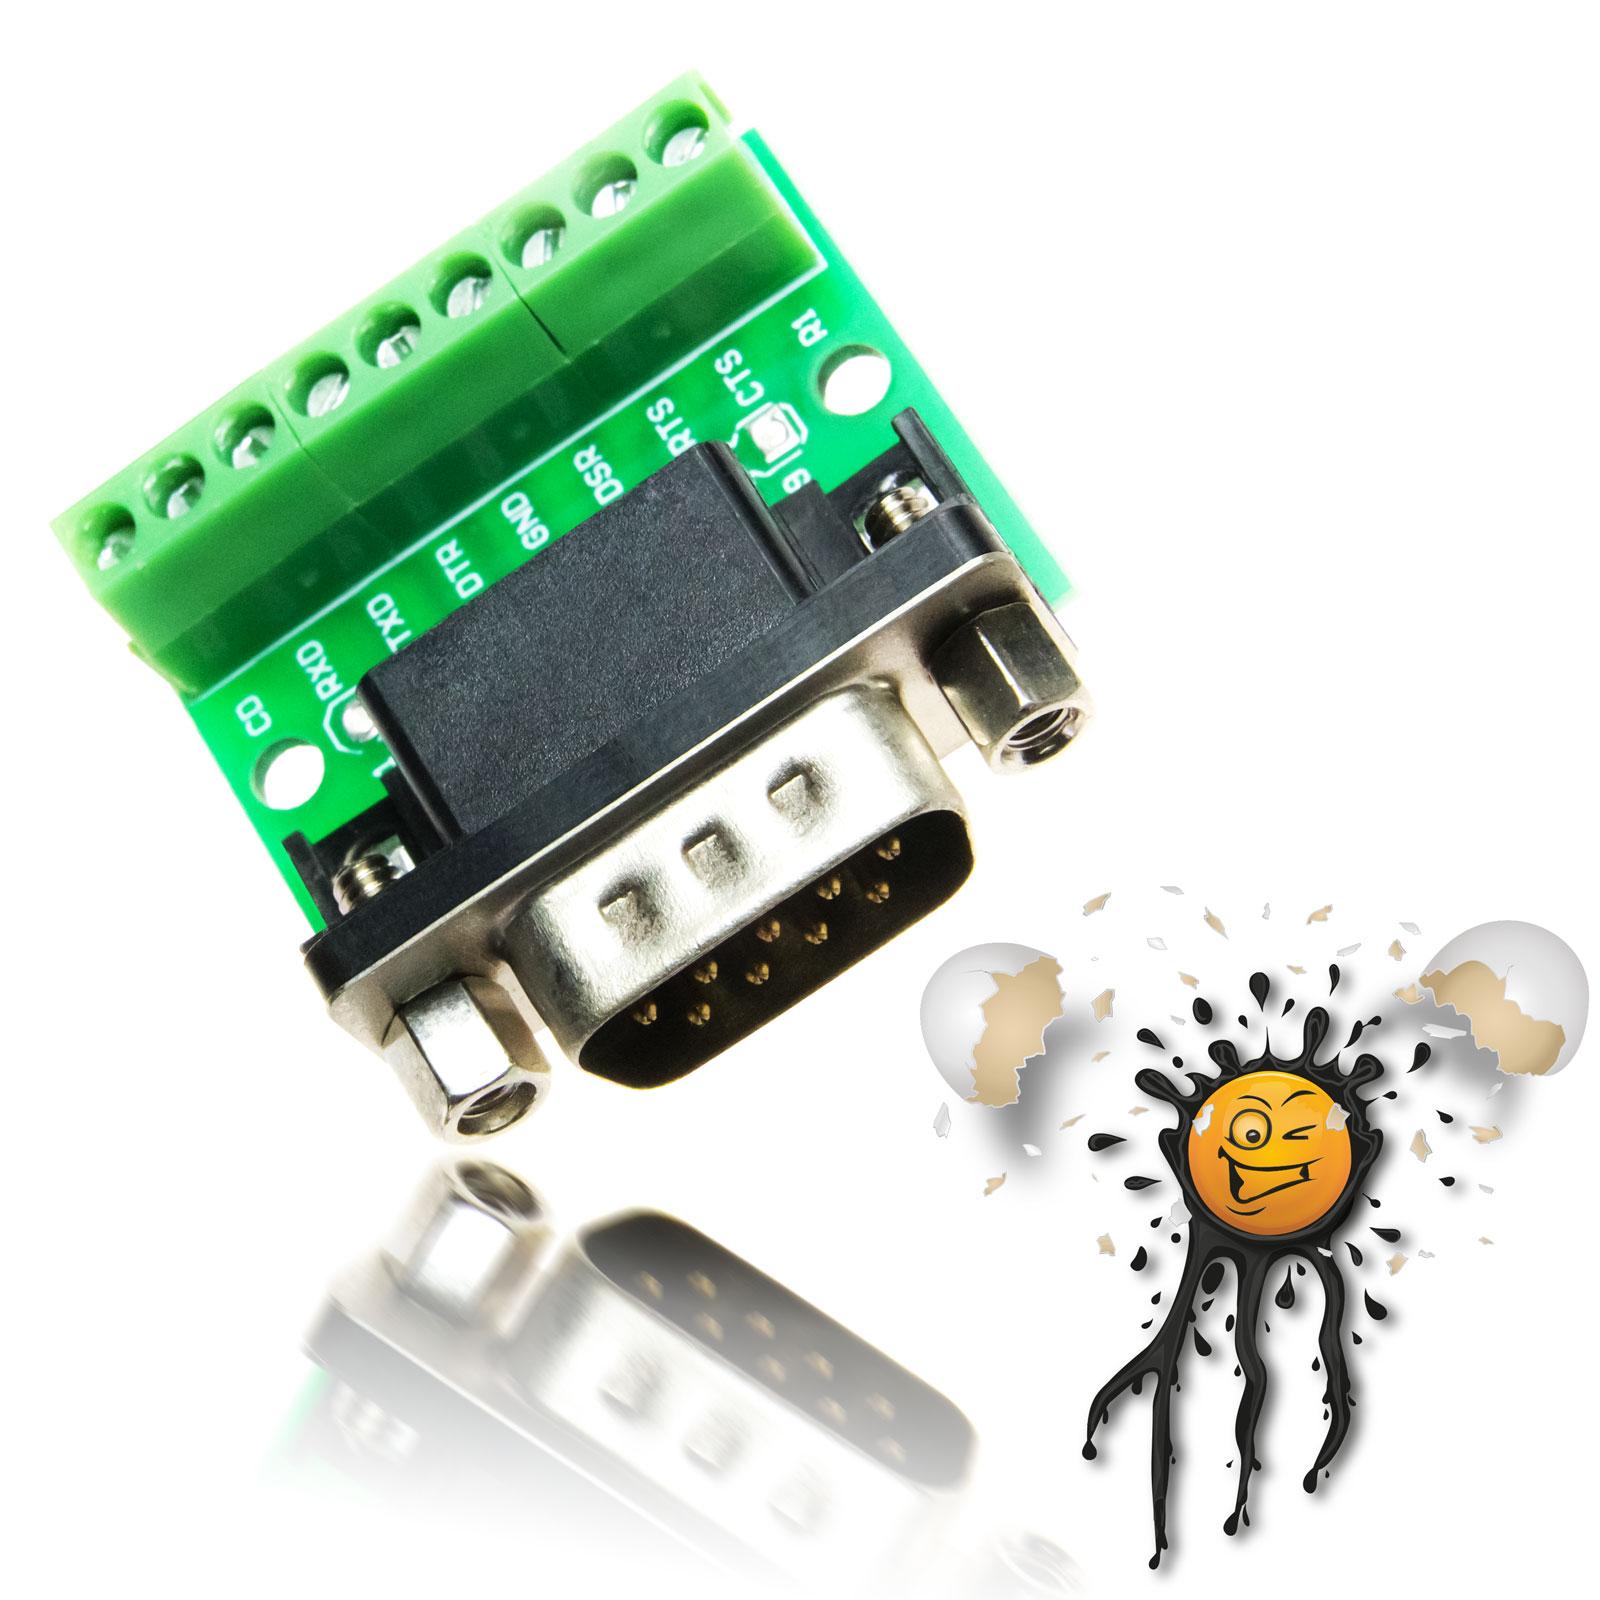 DB9 RS232 serial female Adapter